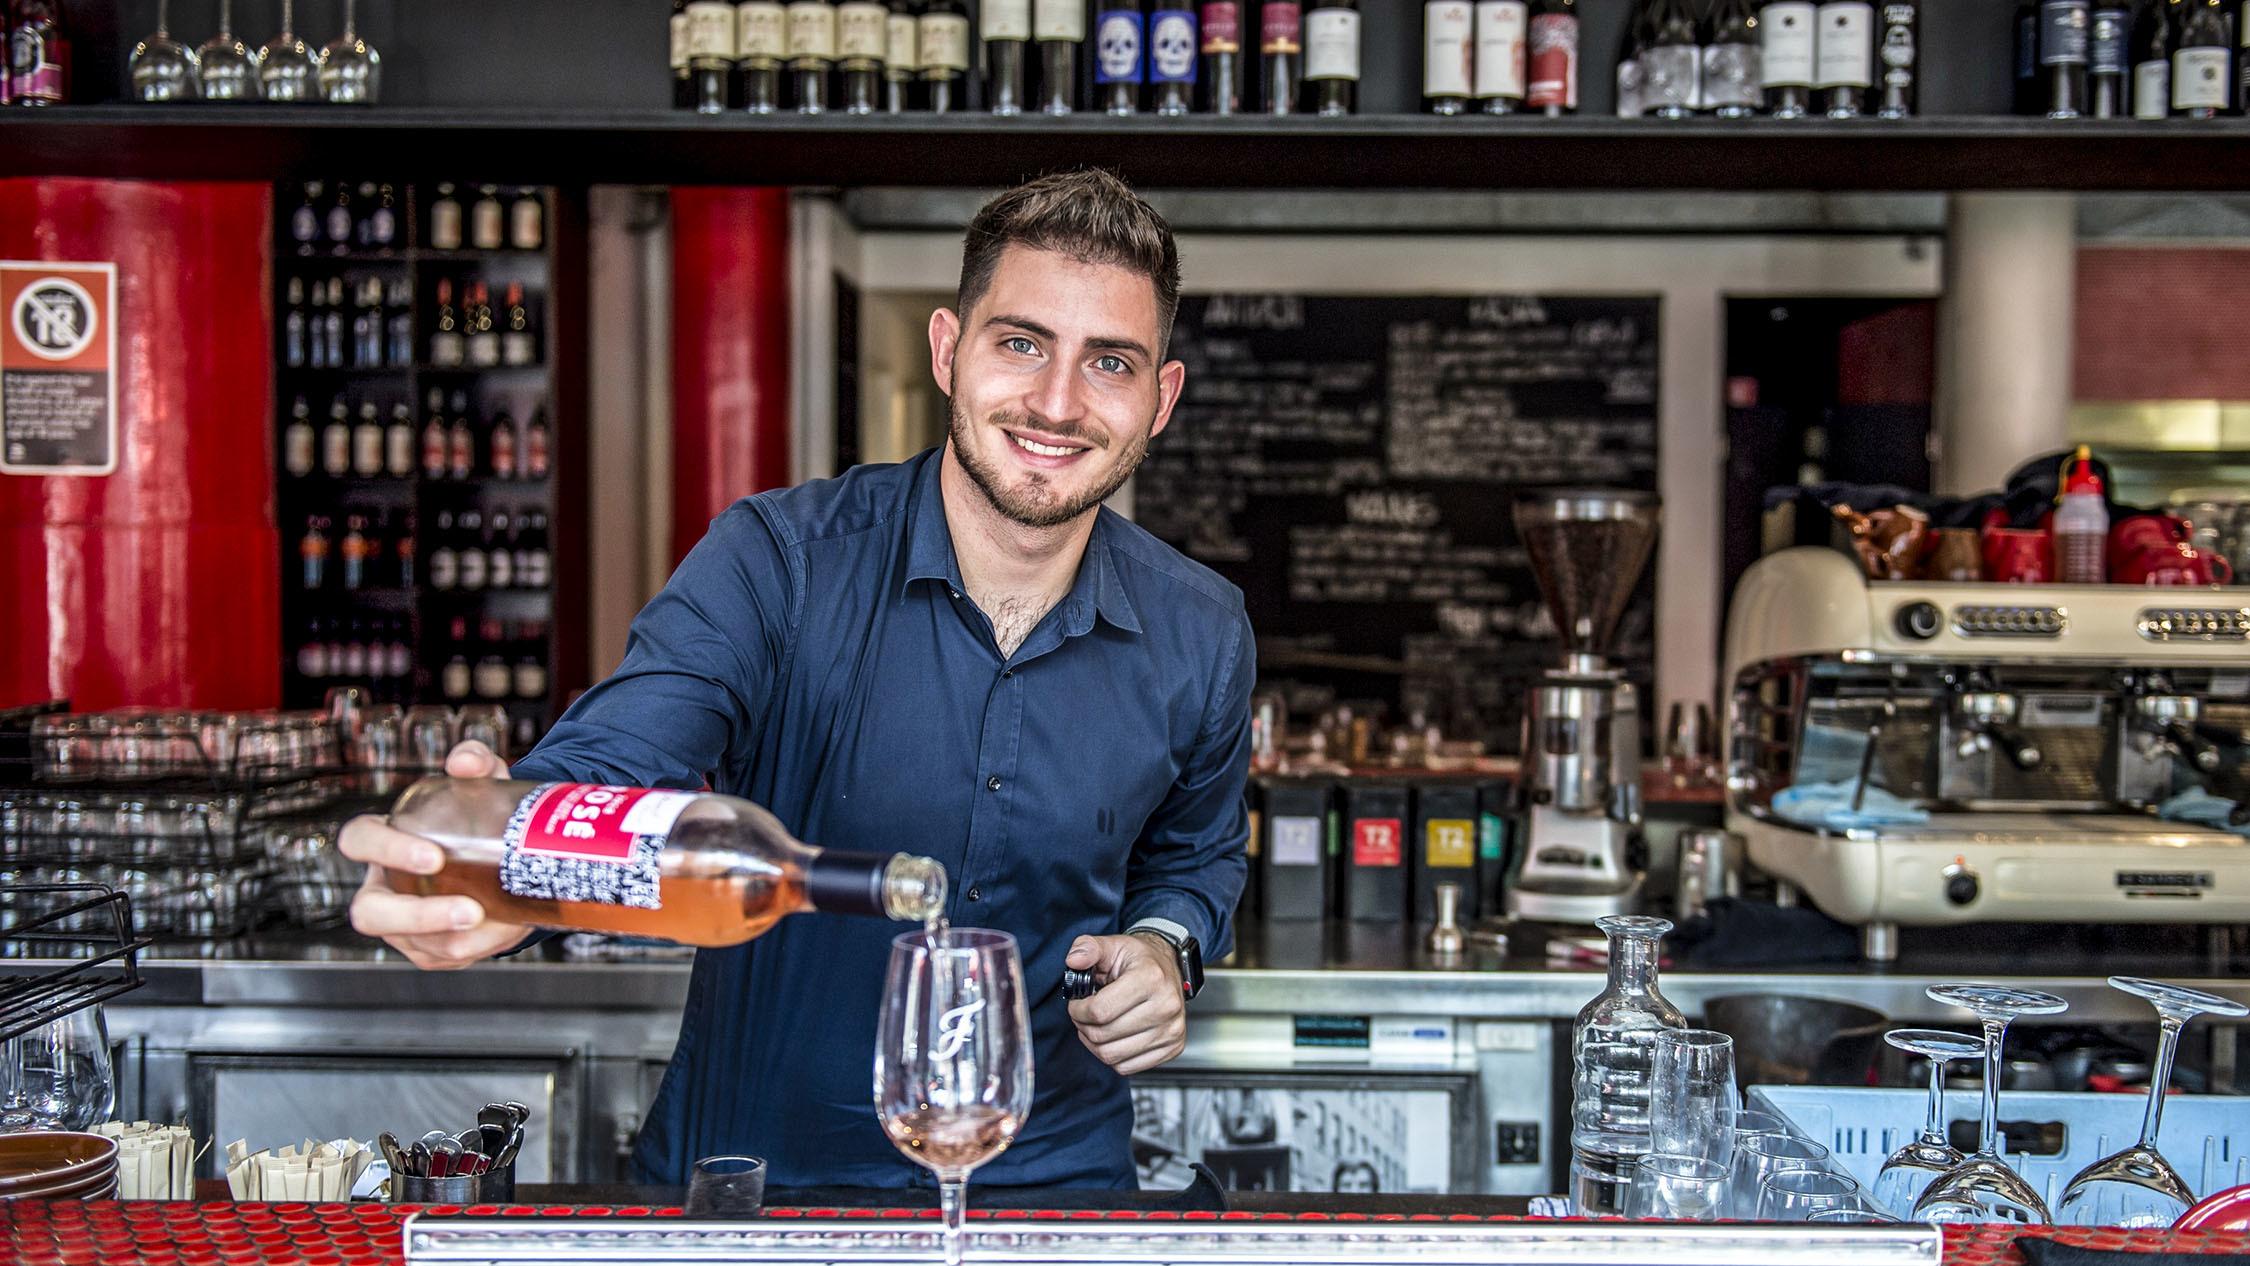 Bartender at Fratelli Fresh Walsh Bay